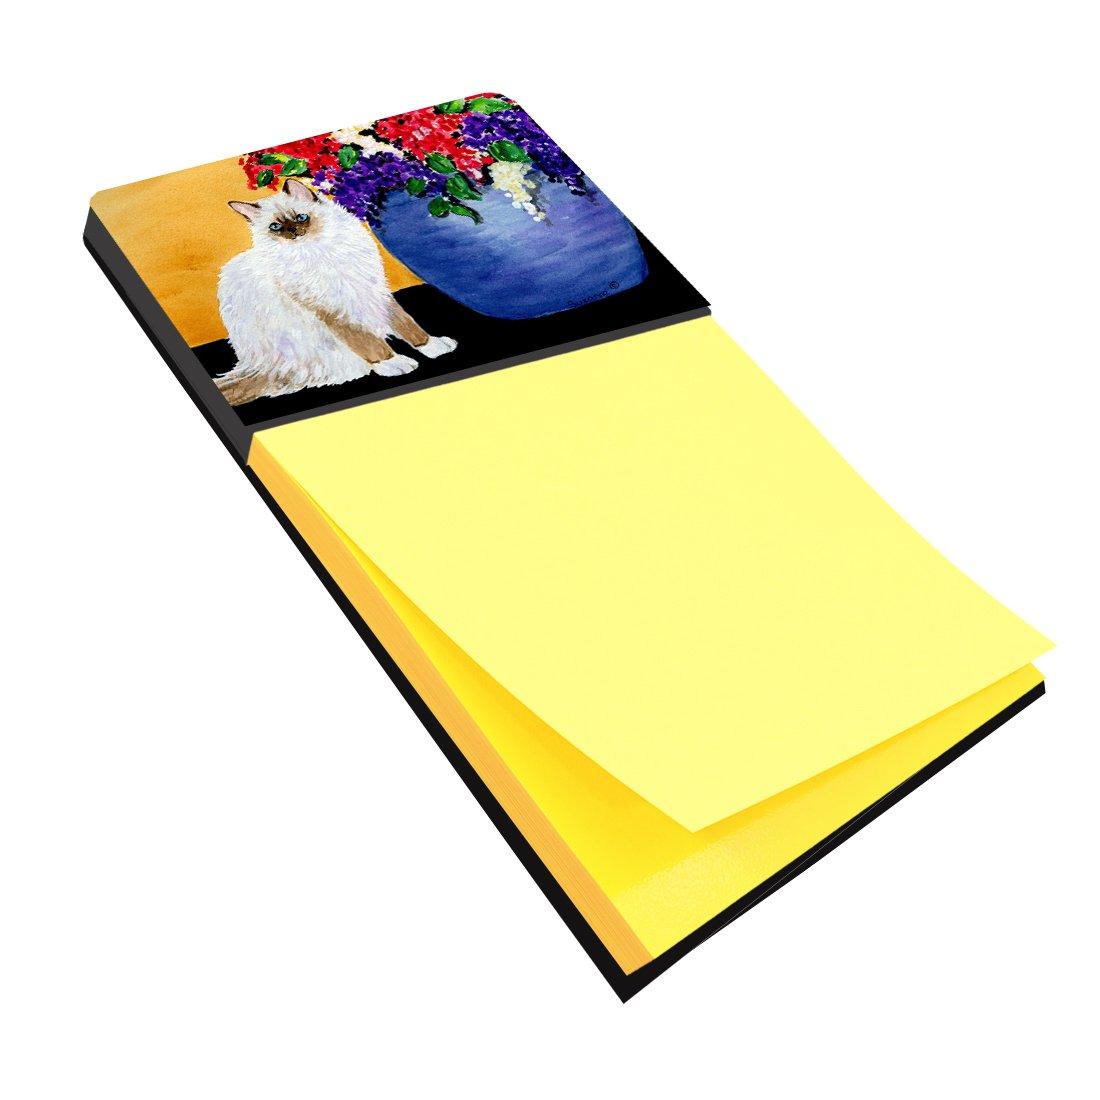 Caroline's Treasures SS8604SN Cat - Ragdoll Refiillable Sticky Note Holder or Postit Note Dispenser, Large, Multicolor